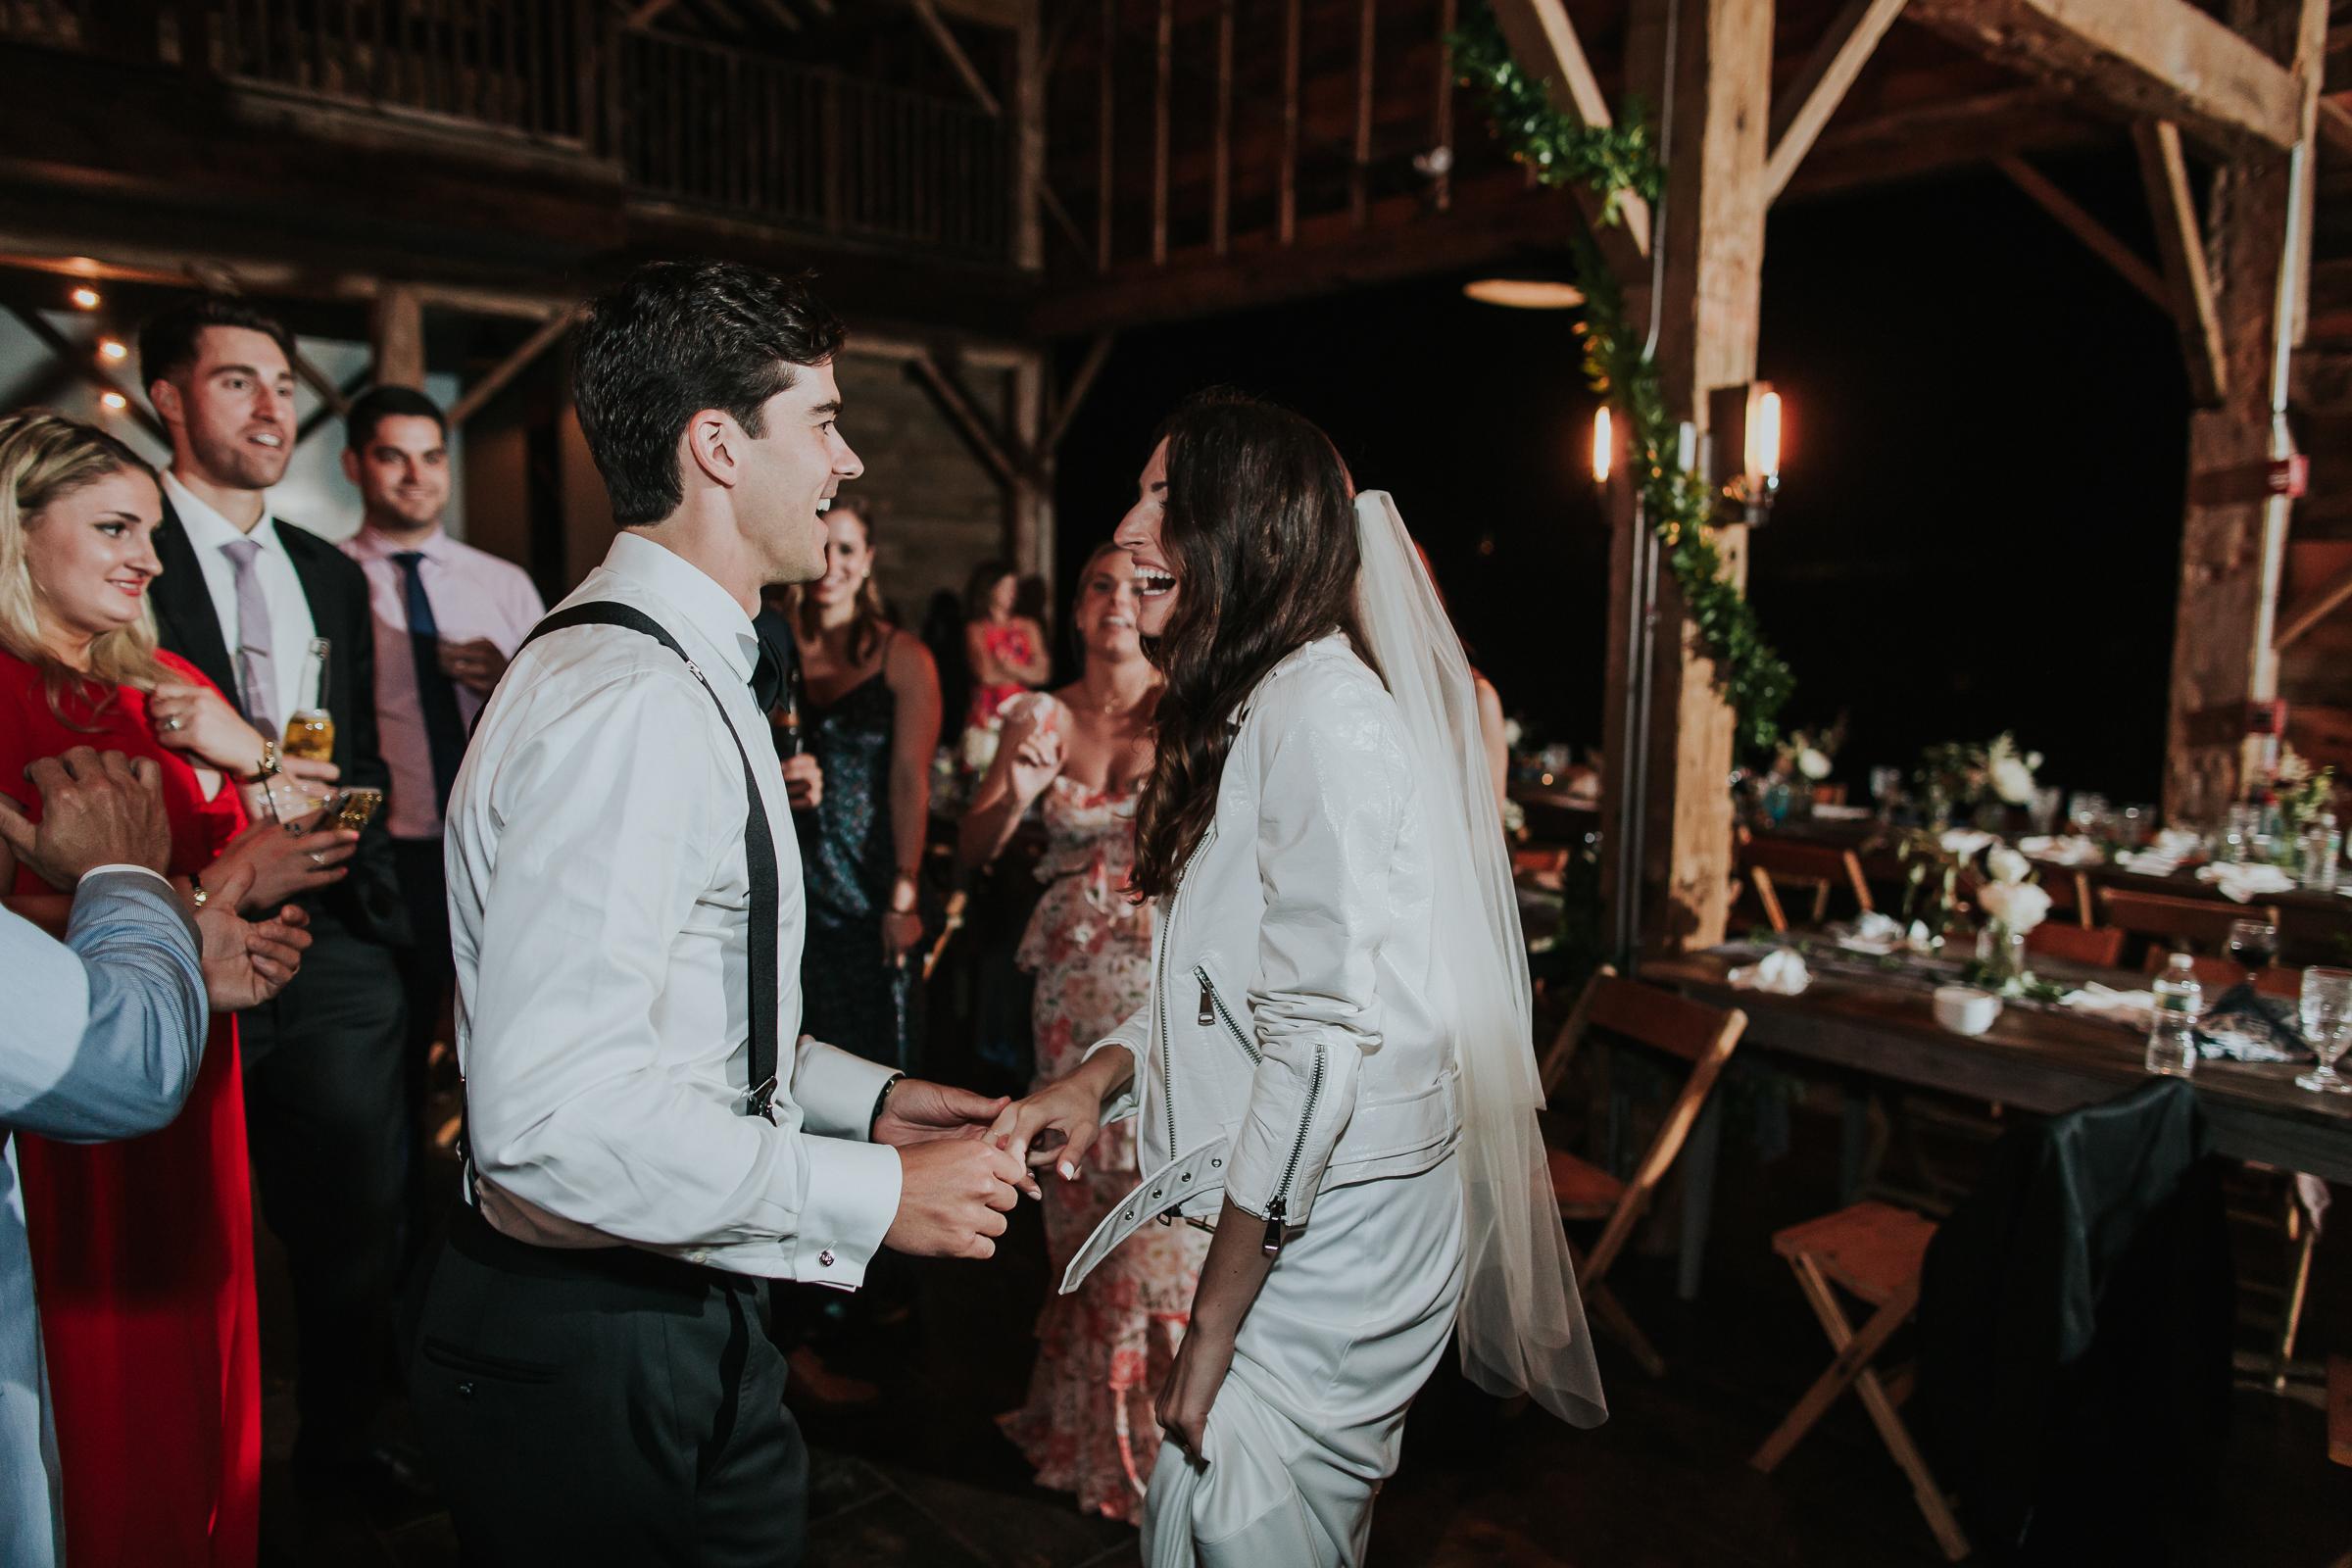 Handsome-Hollow-Long-Eddy-Catskills-New-York-Fine-Art-Documentary-Wedding-Photographer-139.jpg